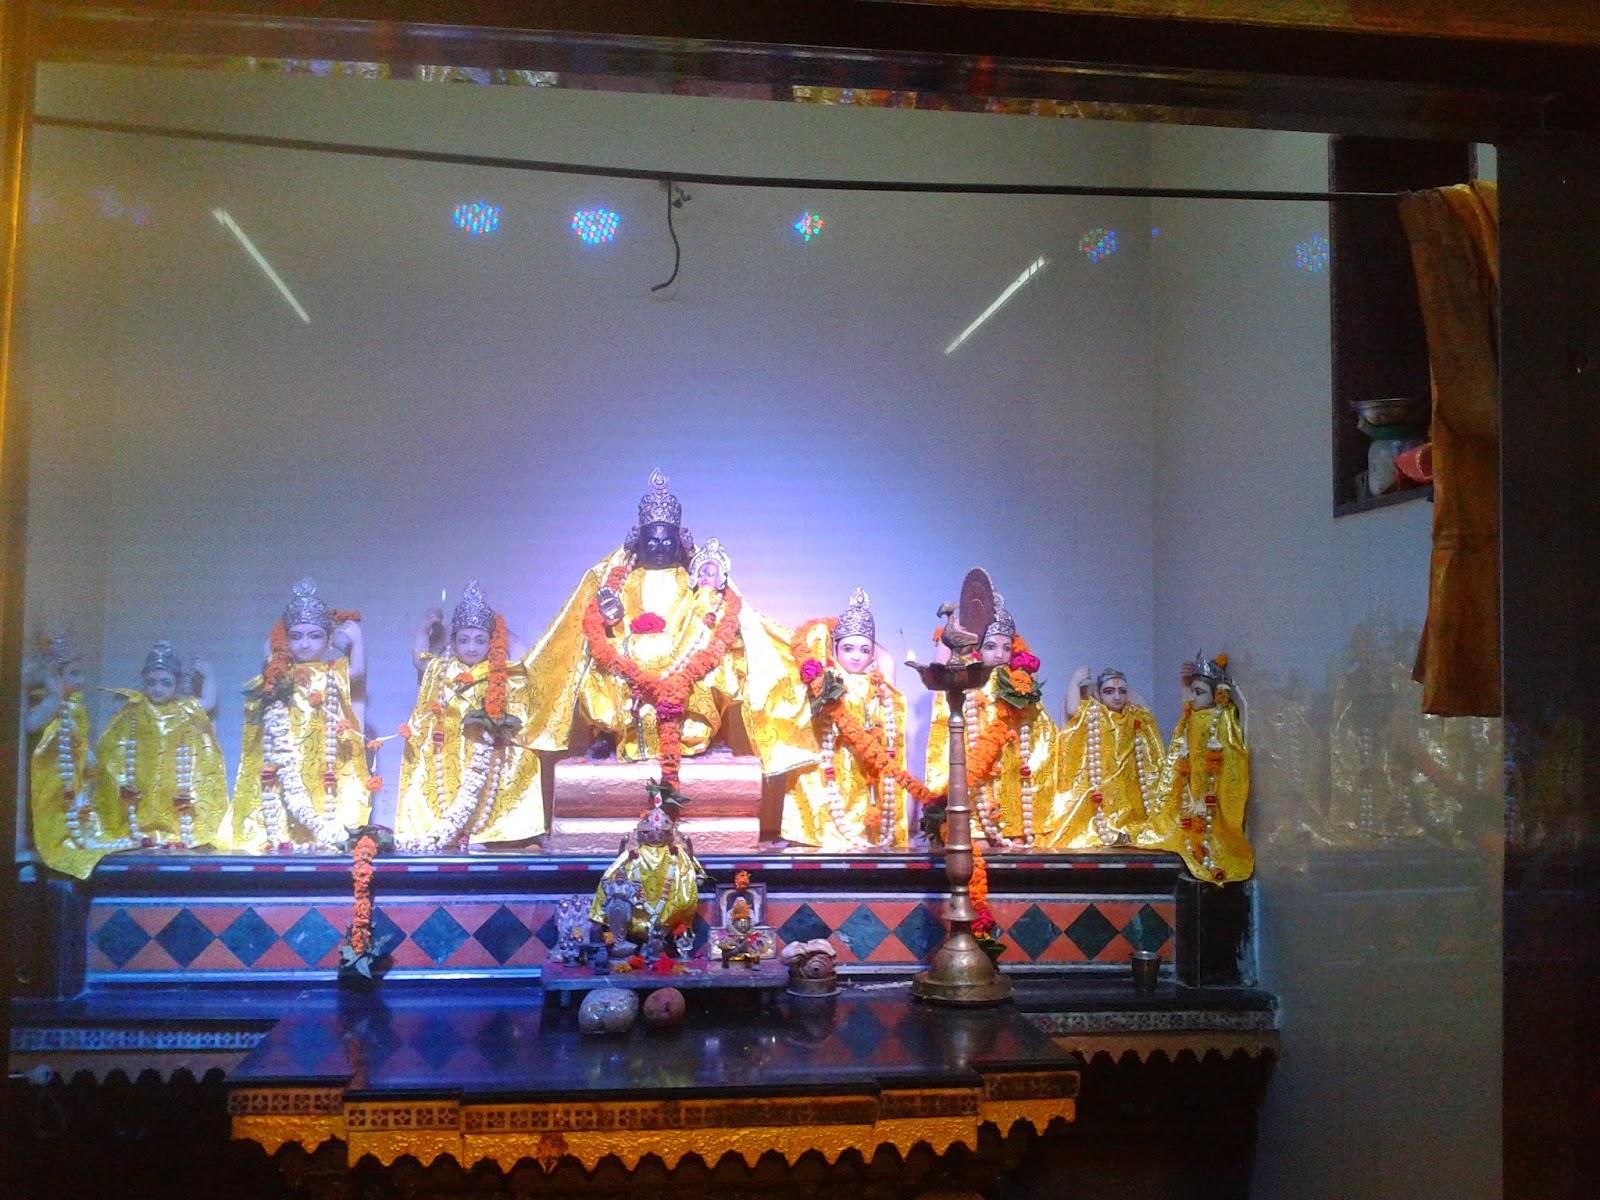 Image: Pattabhishit Lord Shriram Temple, Dhule